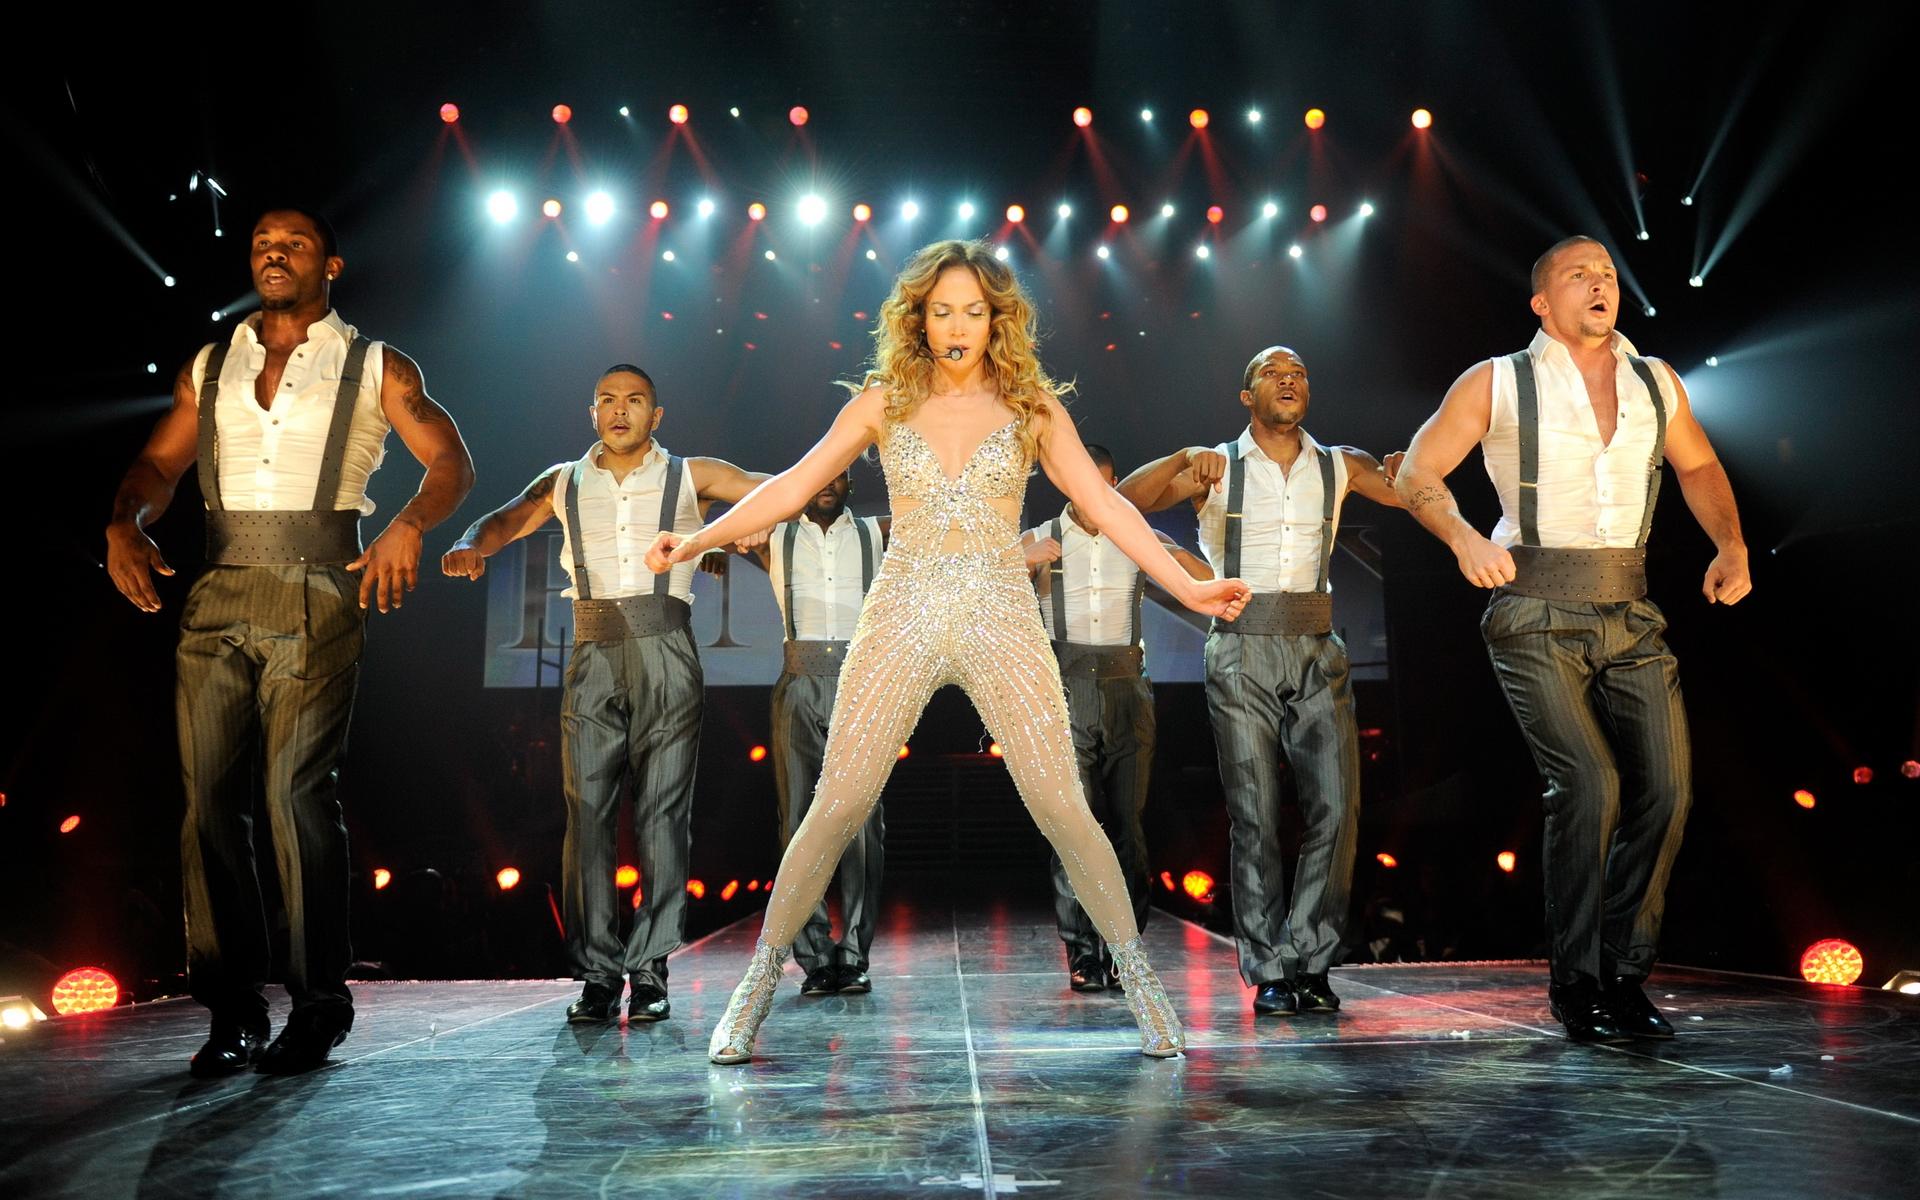 Jennifer Lopez en concierto - 1920x1200